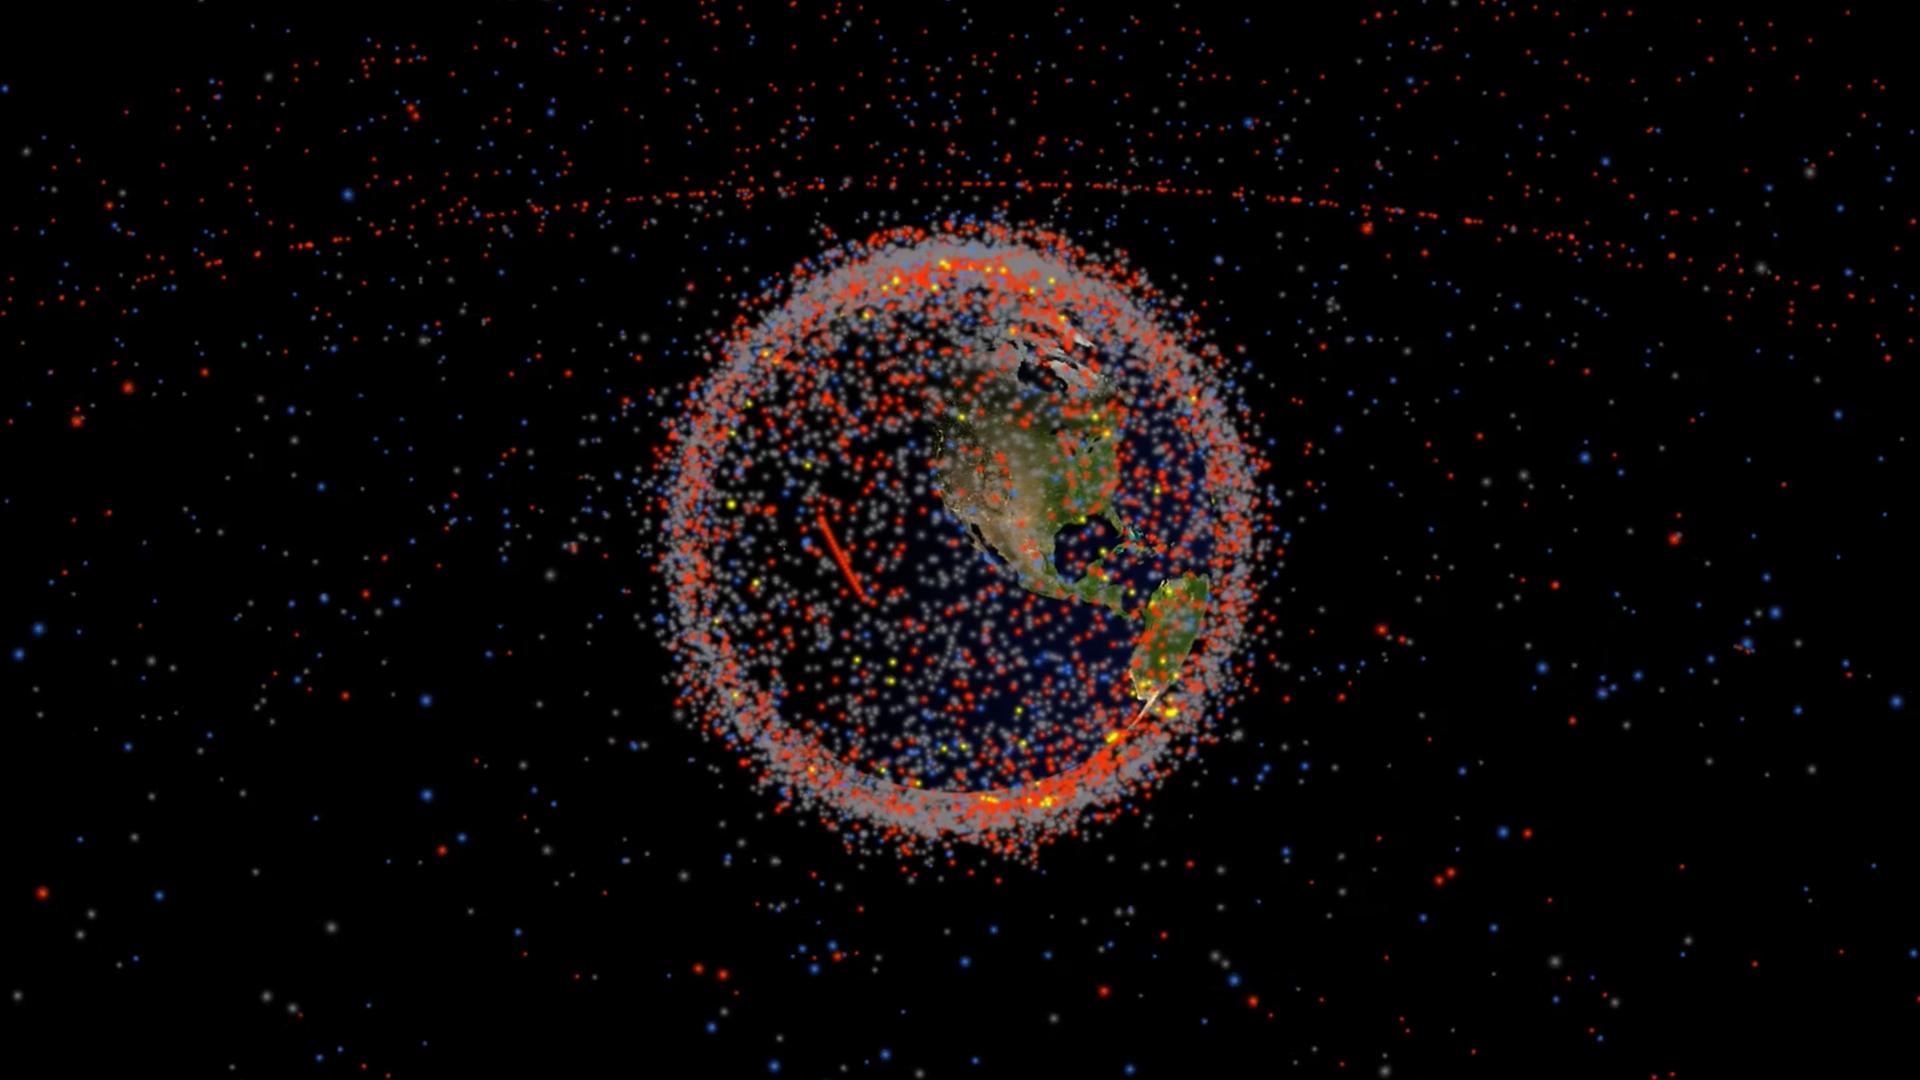 o problema de detritos na órbita da Terra